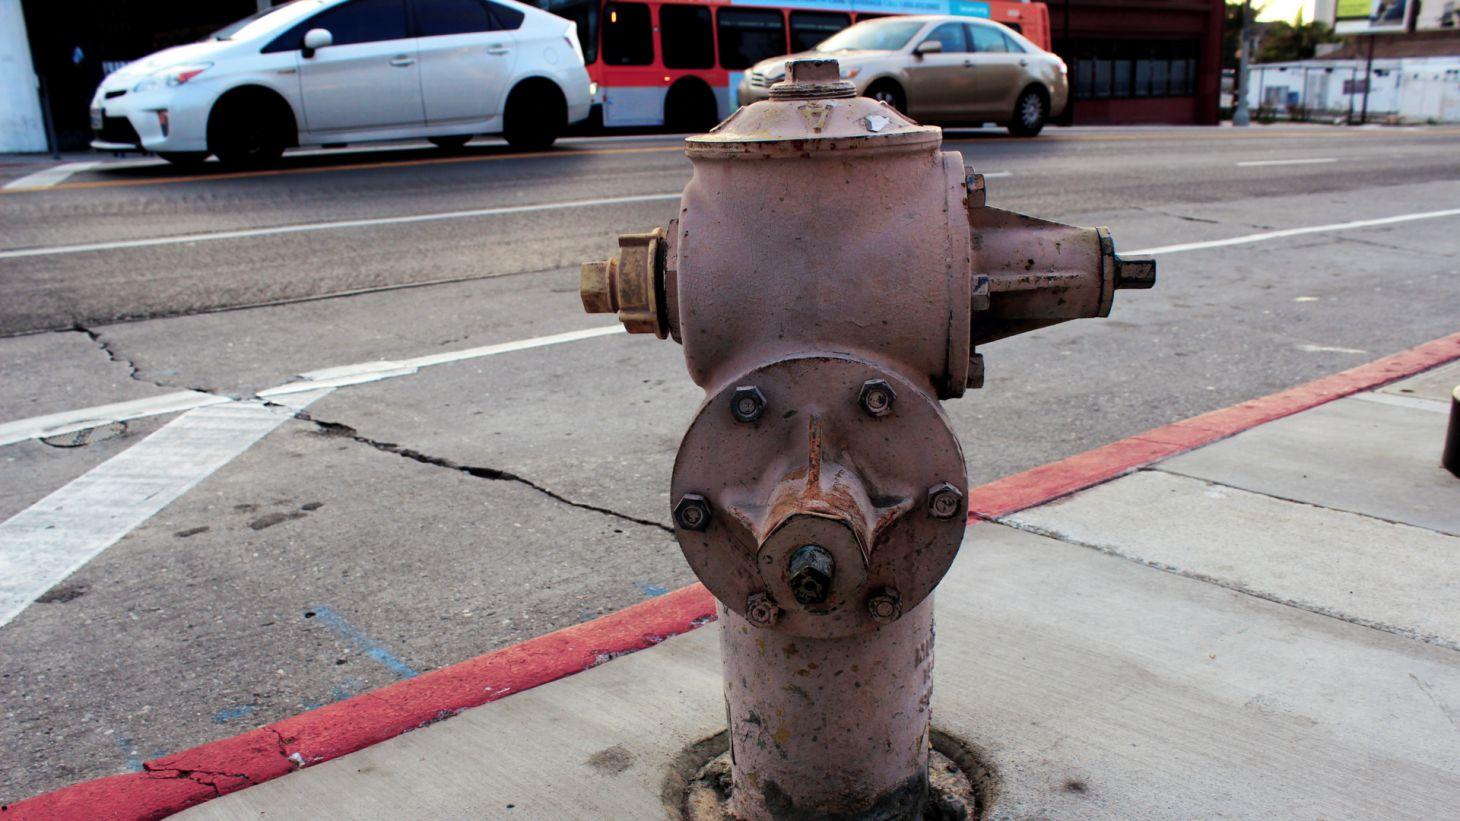 estacionar carro perto hidrante corpo bombeiros multa reboque